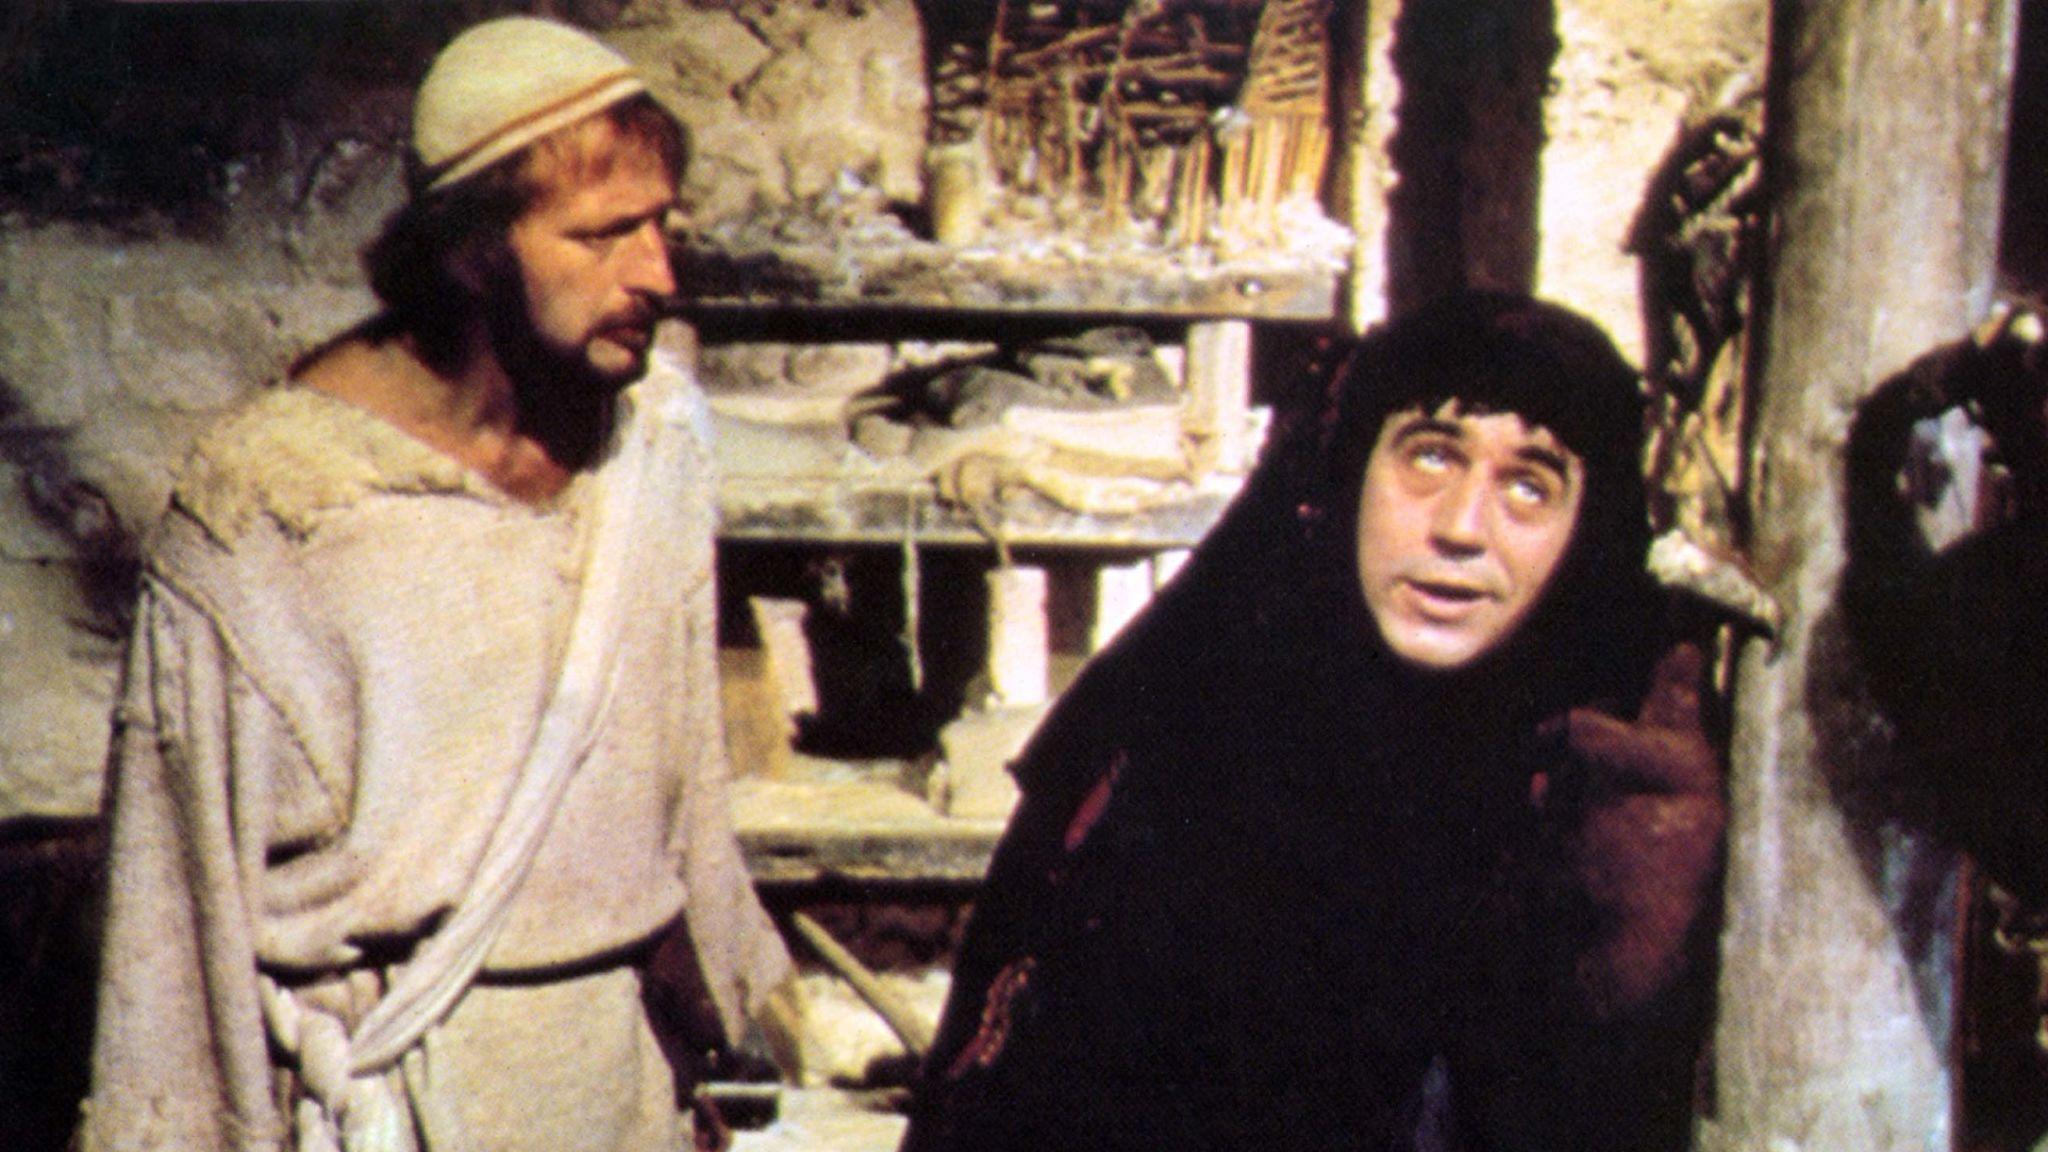 Monty Python's Life Of Brian, Graham Chapman, Terry Jones in 1979